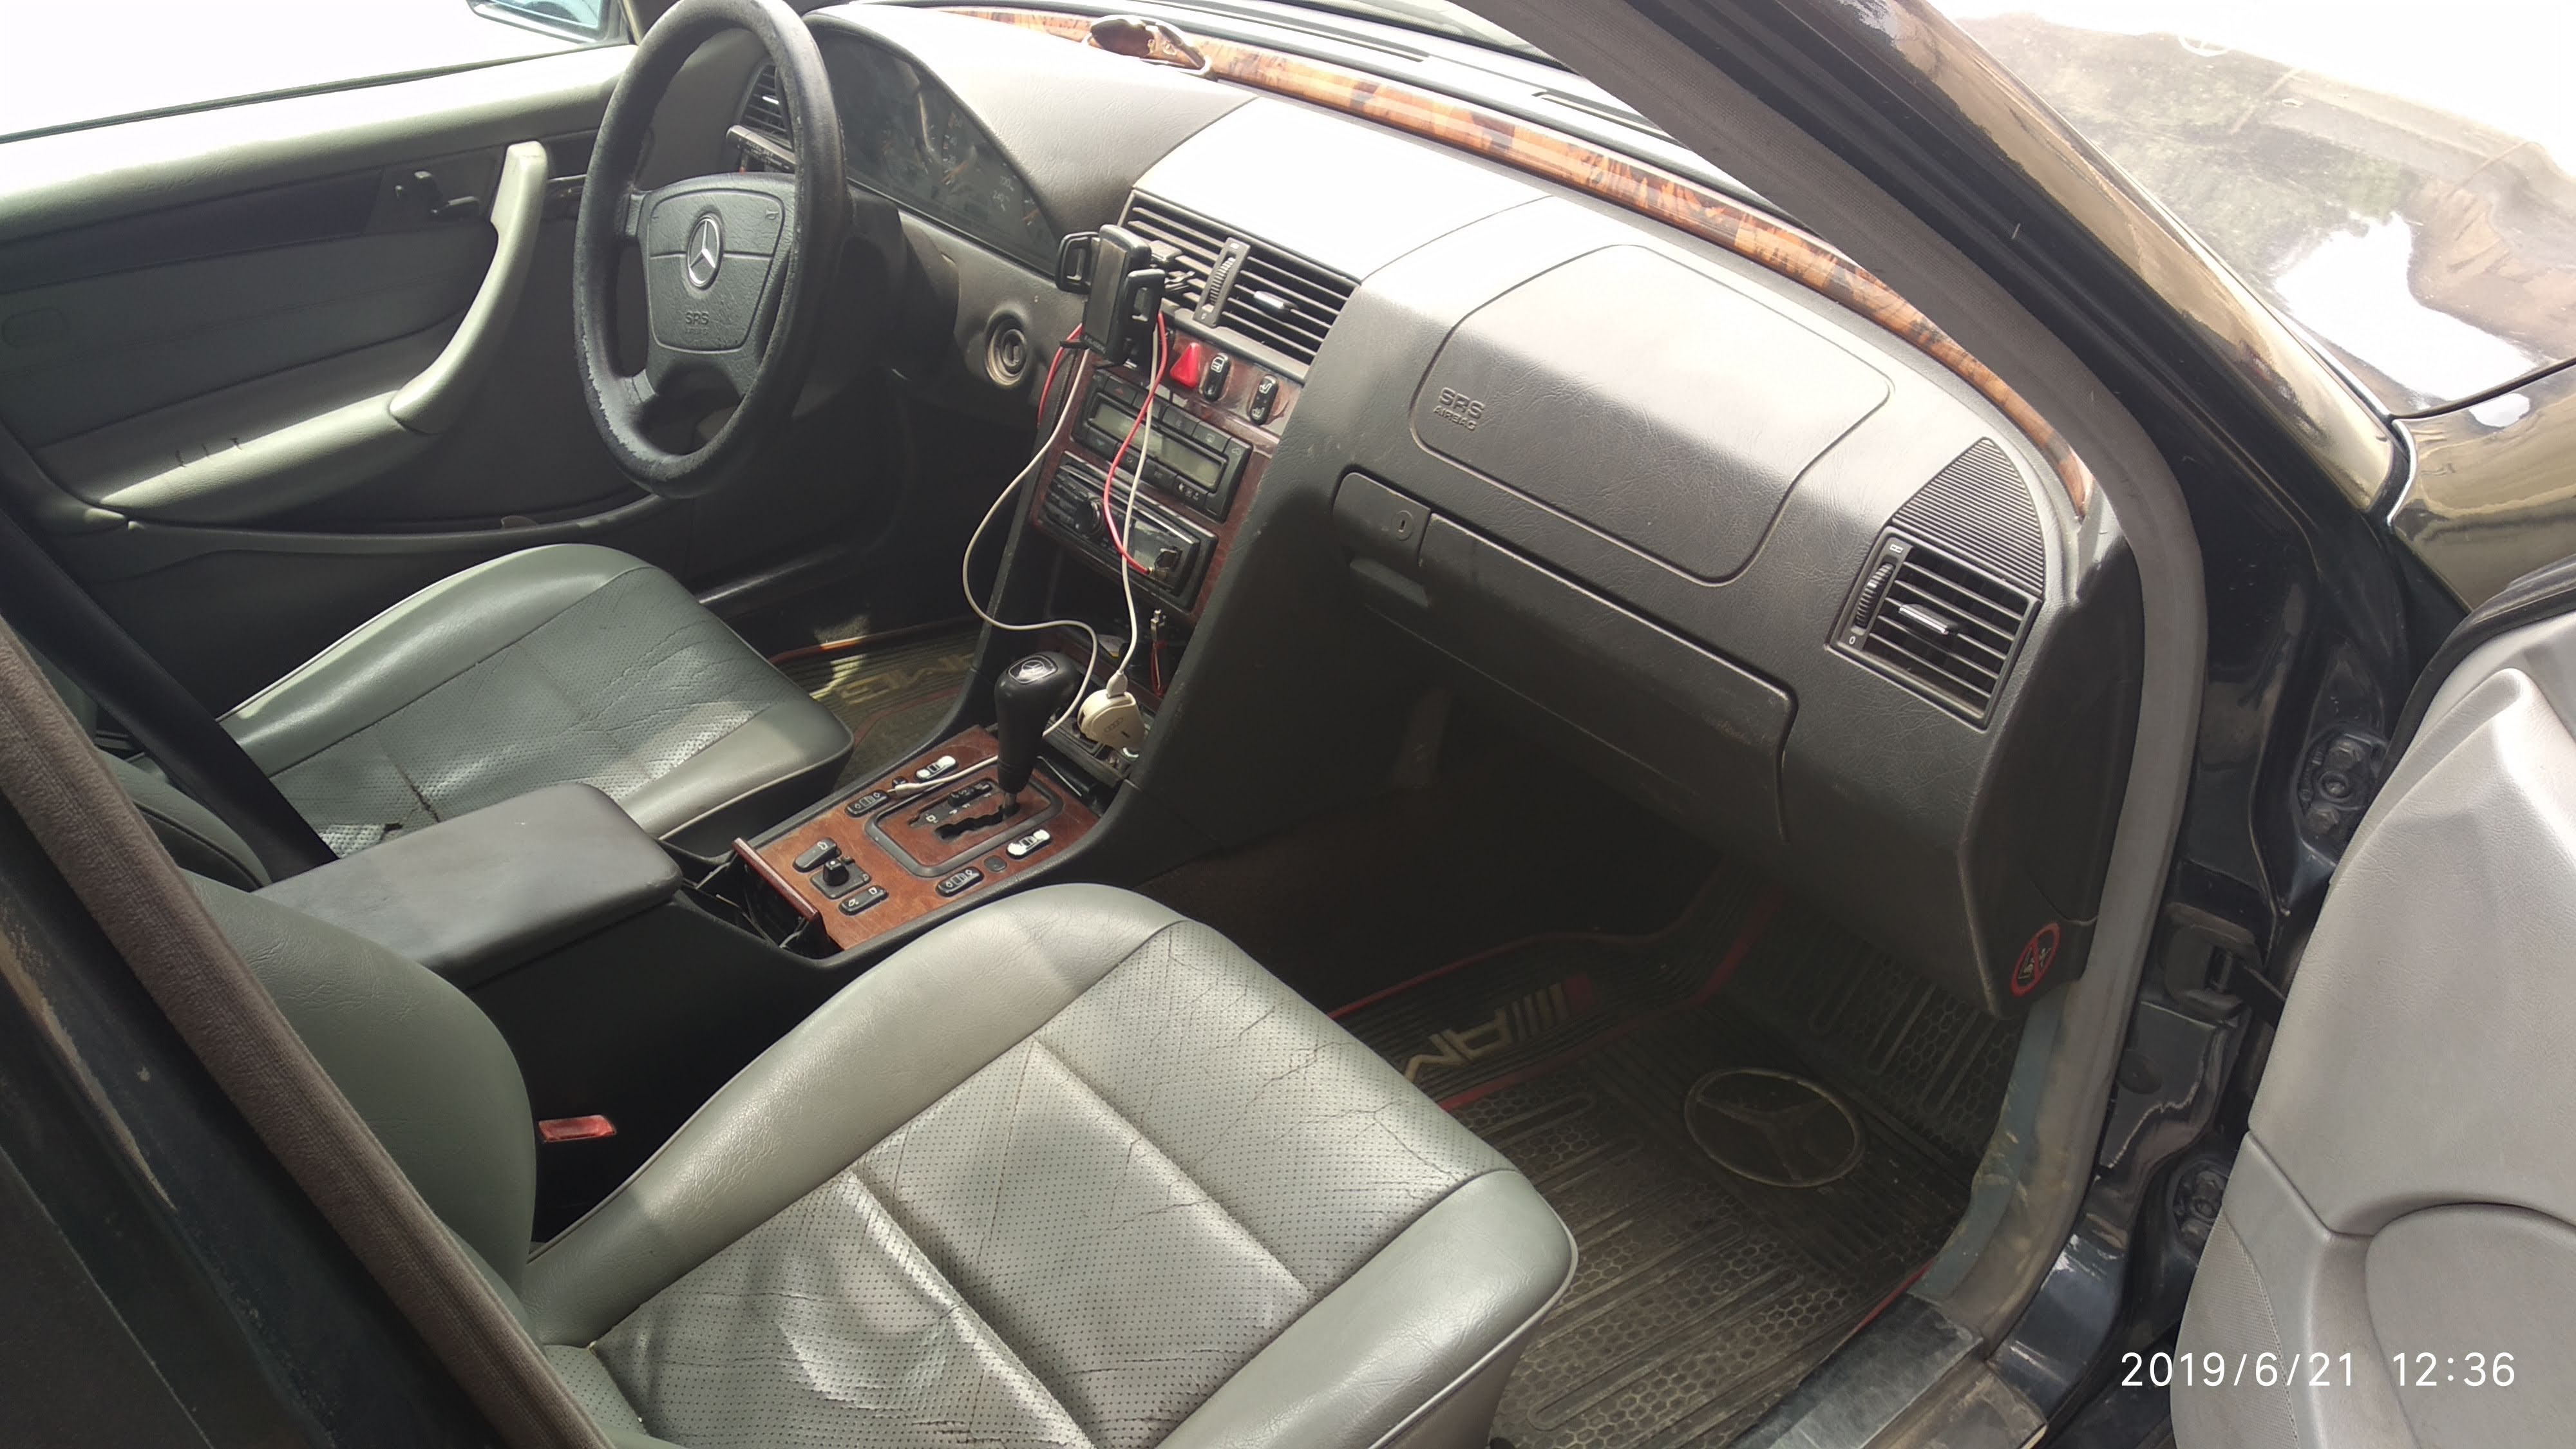 Mercedes-Benz C 200 2.0(lt) 1999 Second hand  $10500